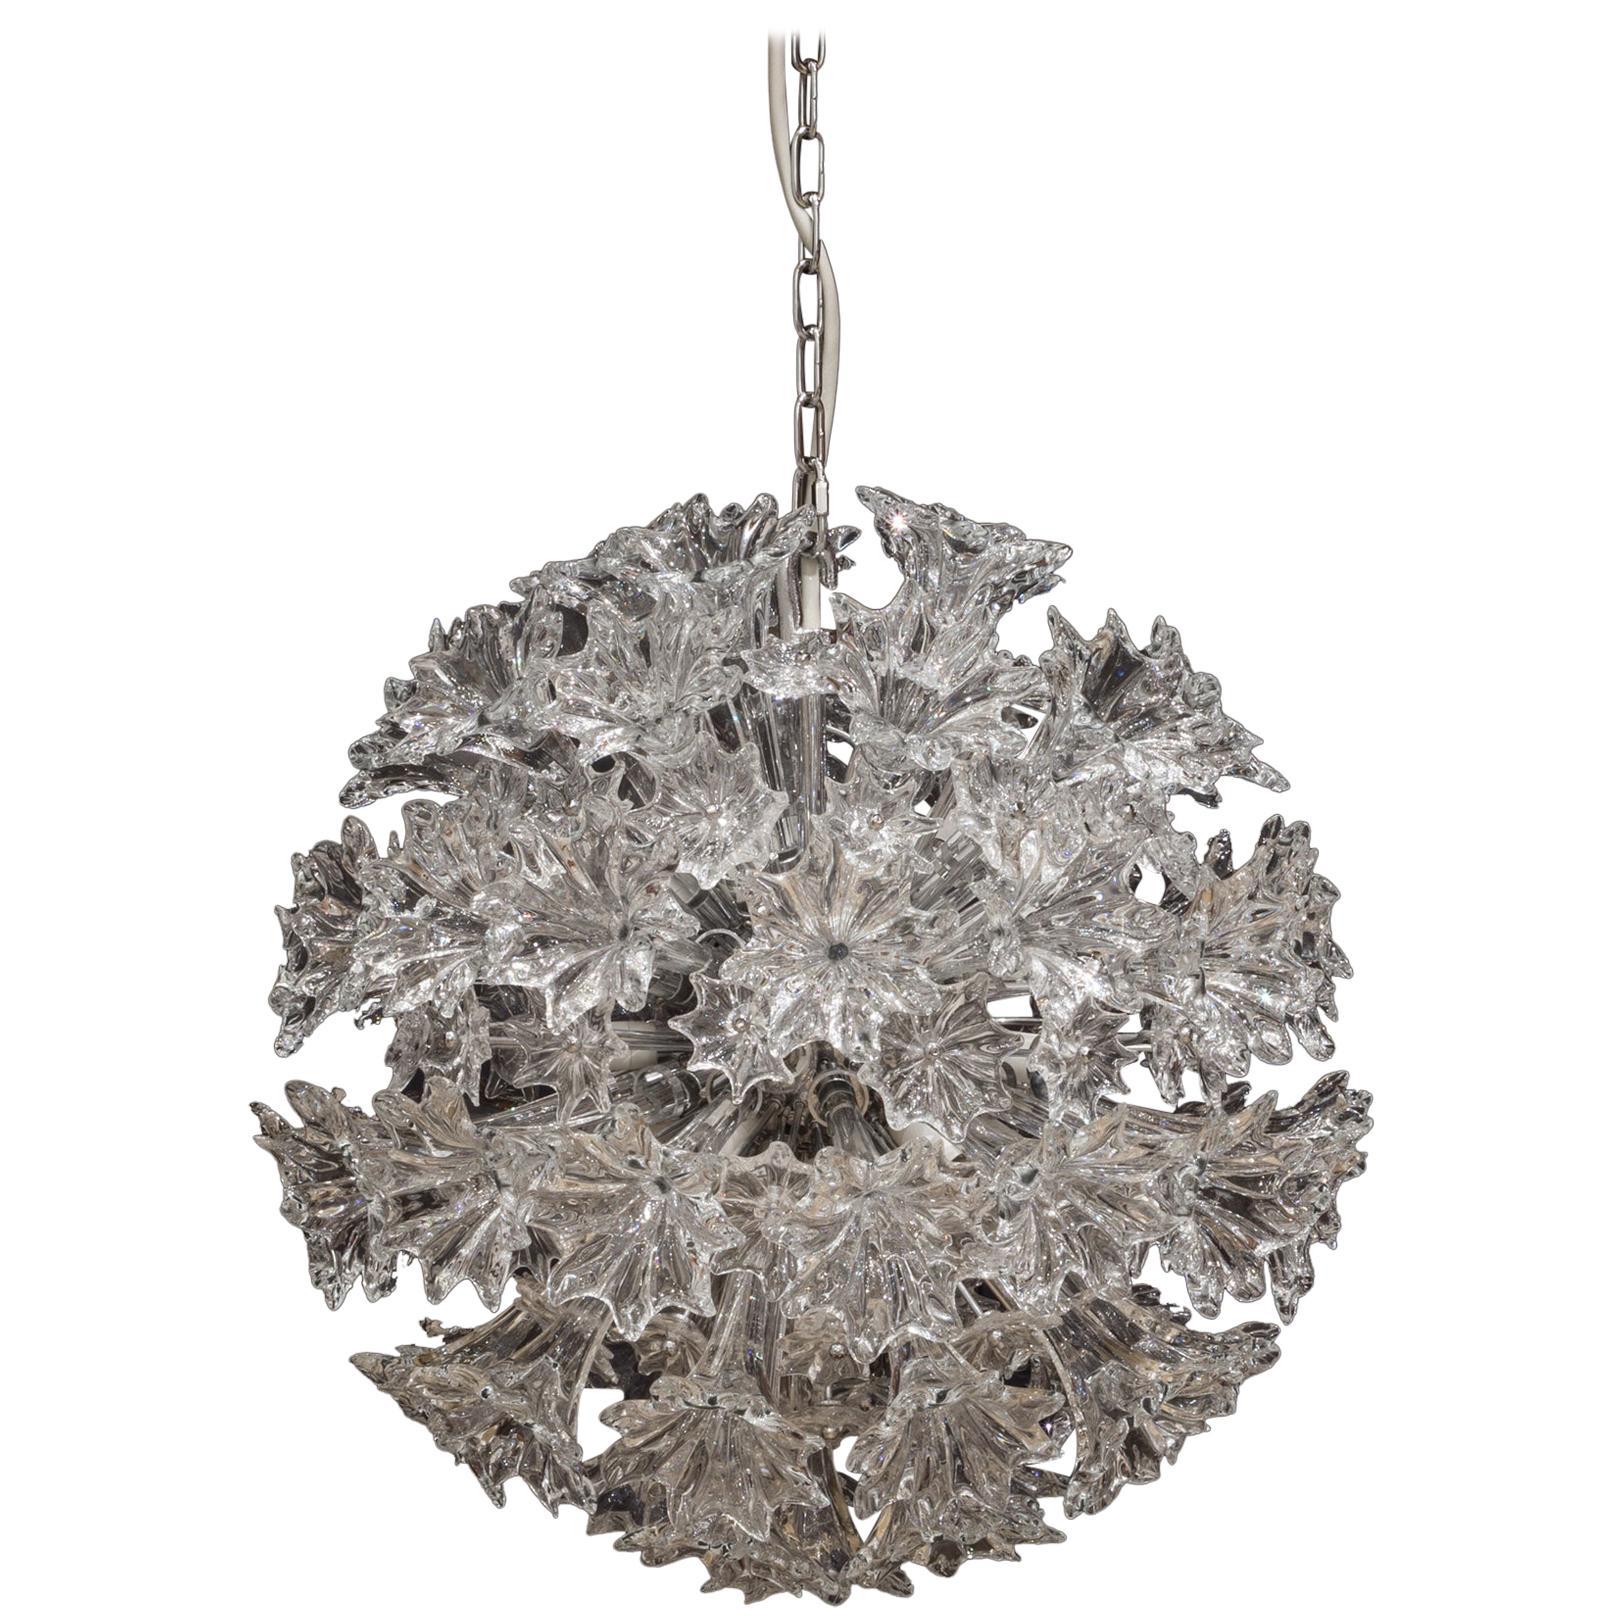 Venini Esprit Crystal Chandelier X-Small